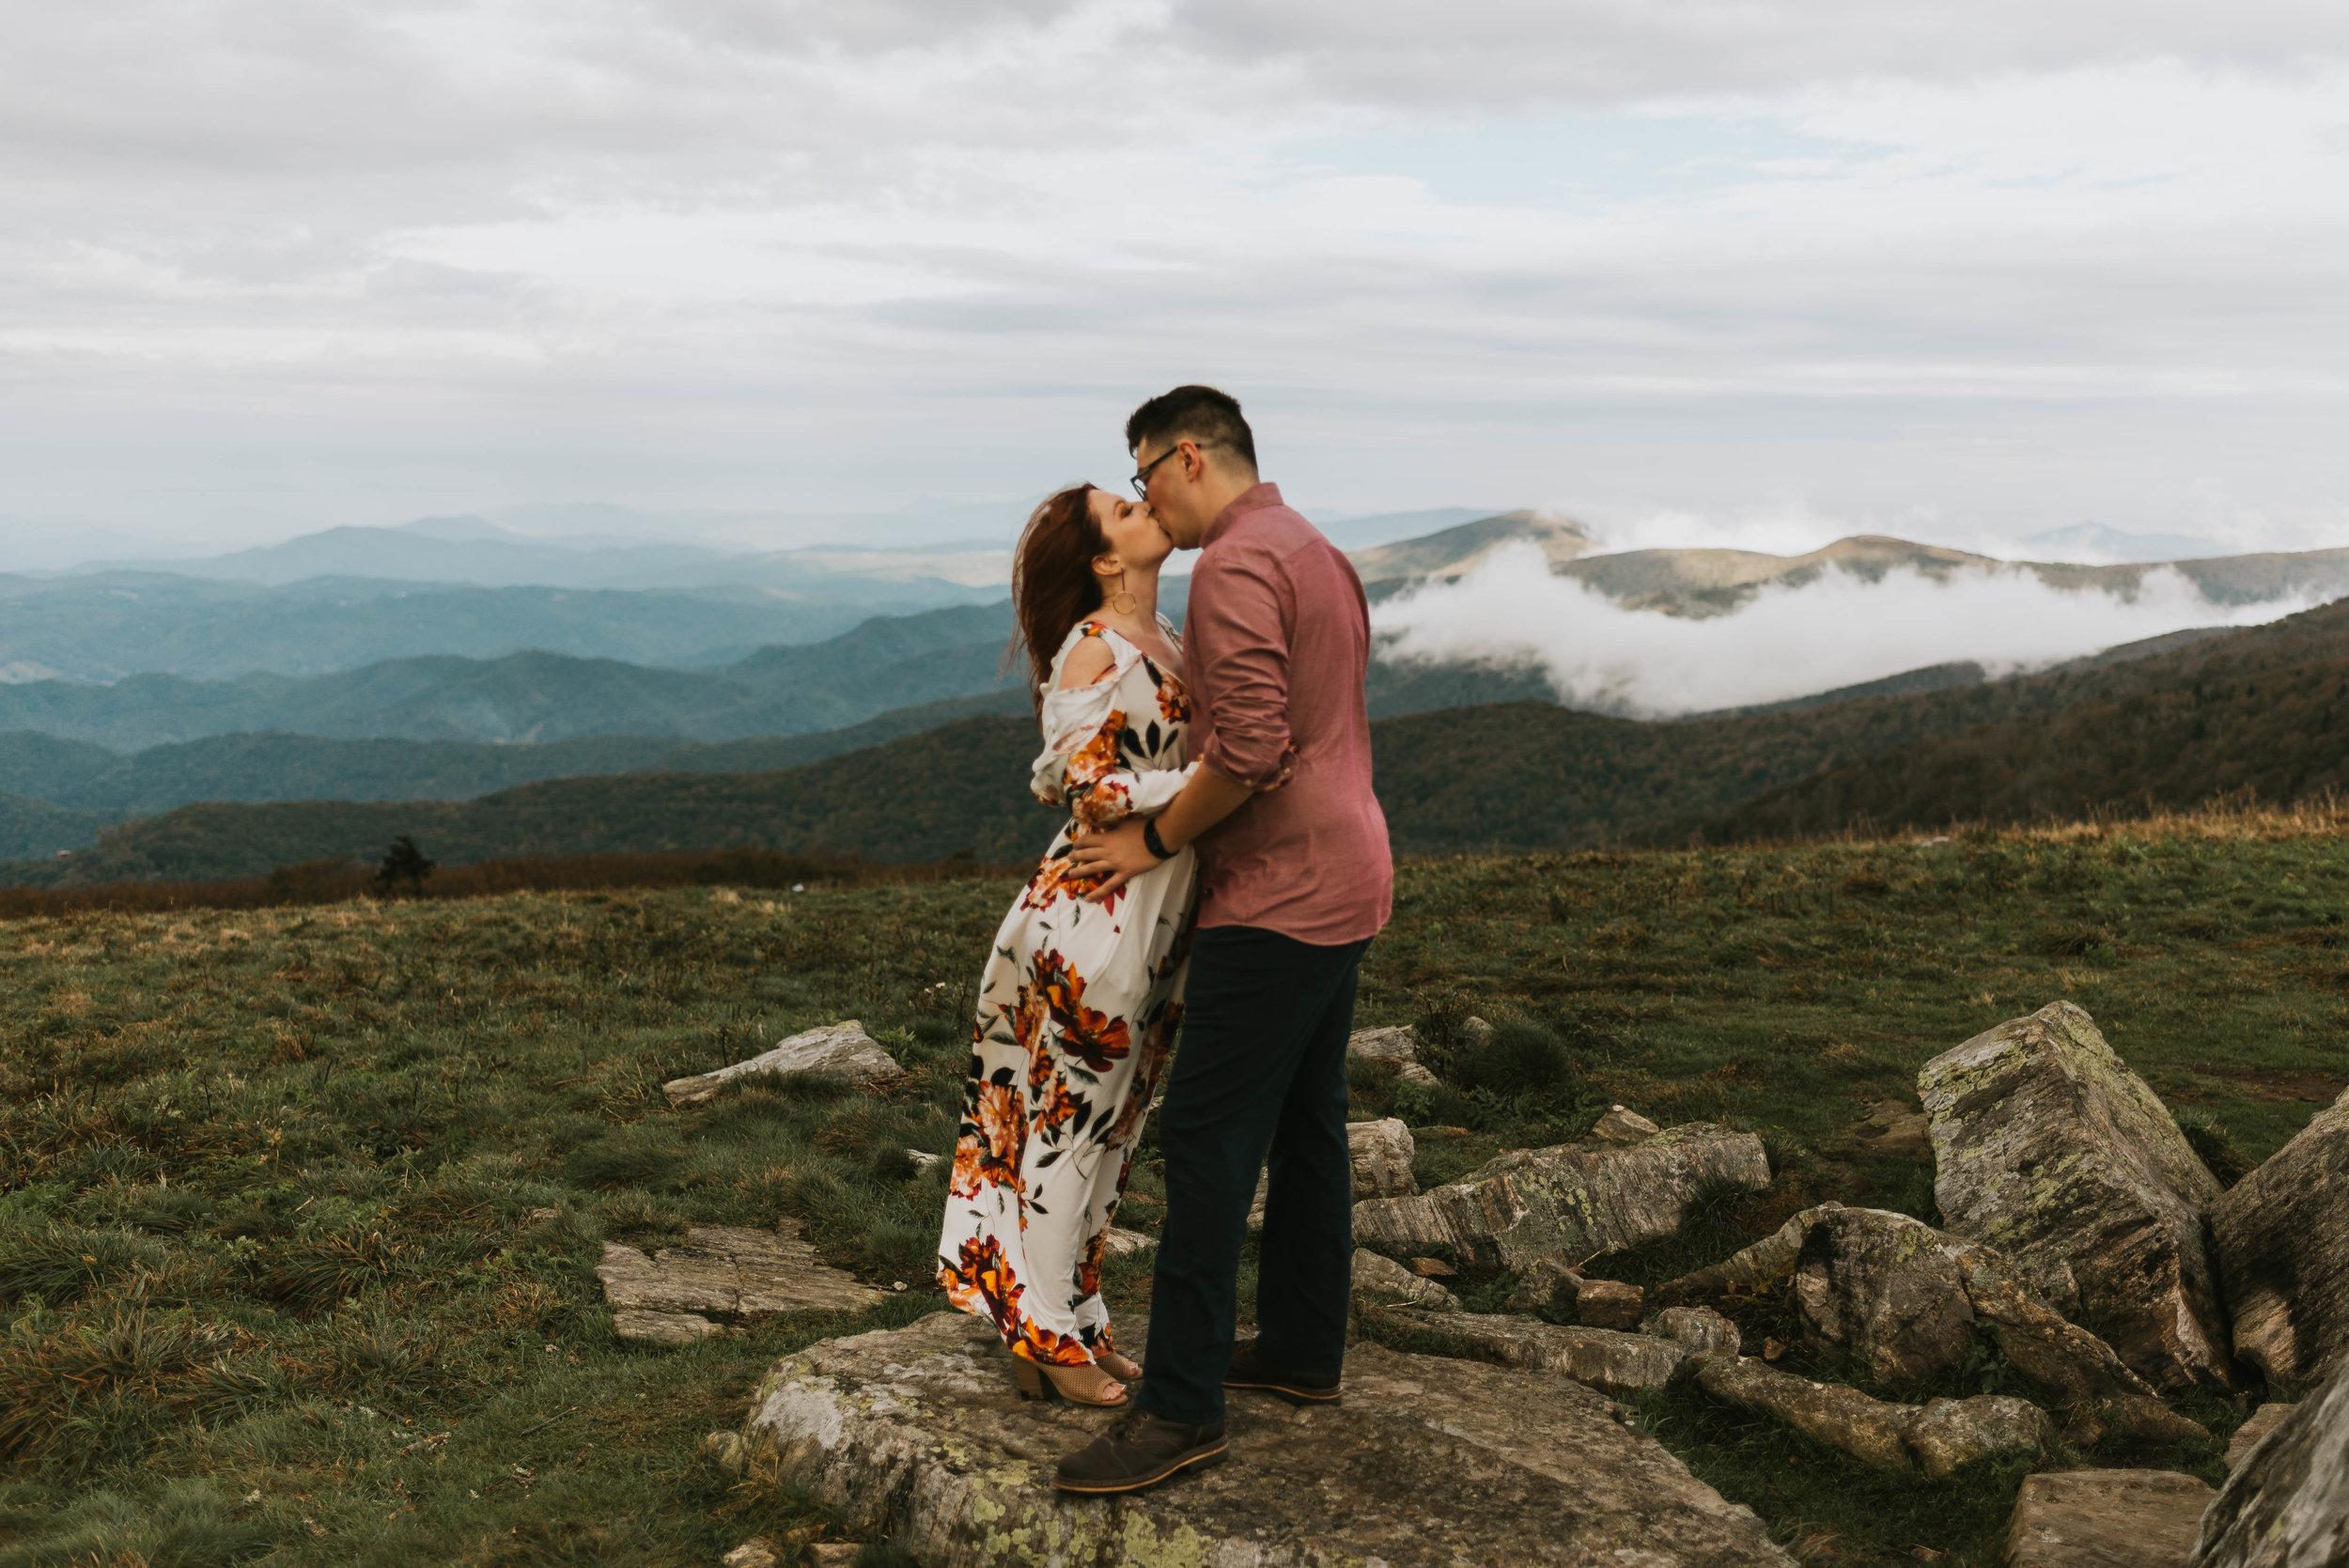 Roan Mountain Engagement Session, Roan Mountain Elopement, Roan Mountain Wedding Northeast Tennessee Wedding Photography, East Tennessee Wedding Photography, Knoxville, Tennessee Wedding Photography